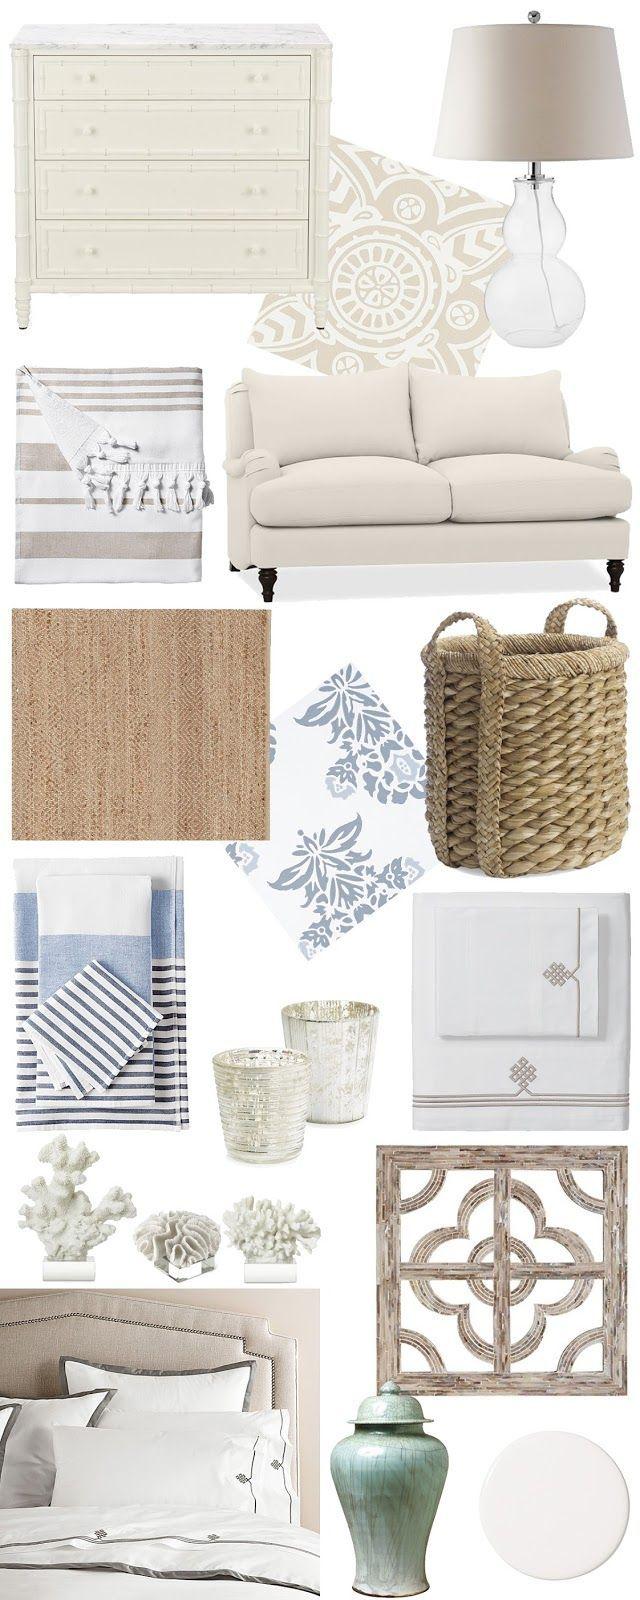 white coastal furniture. Coastal Decor, White, Wicker, Simplistic, Furniture, Home Decor | Trendy Pinterest Coastal, Style And Living Rooms White Furniture O